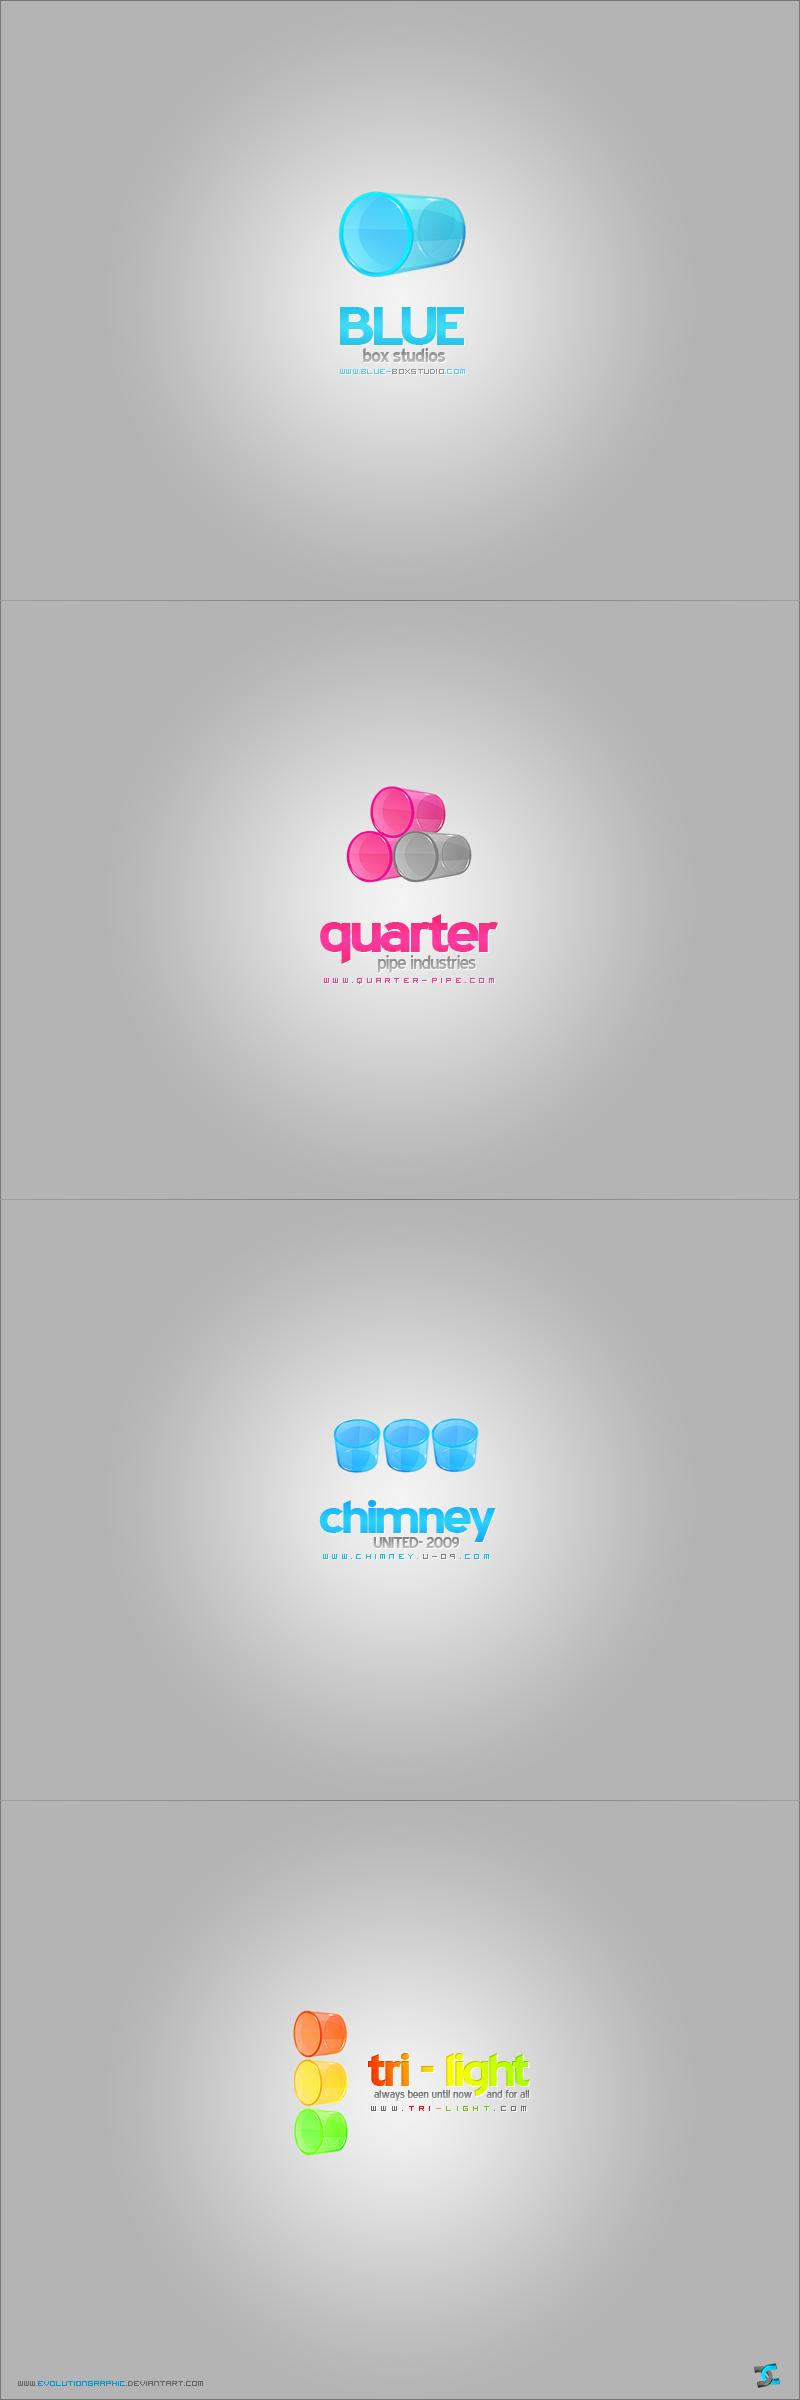 Barrel logotypes